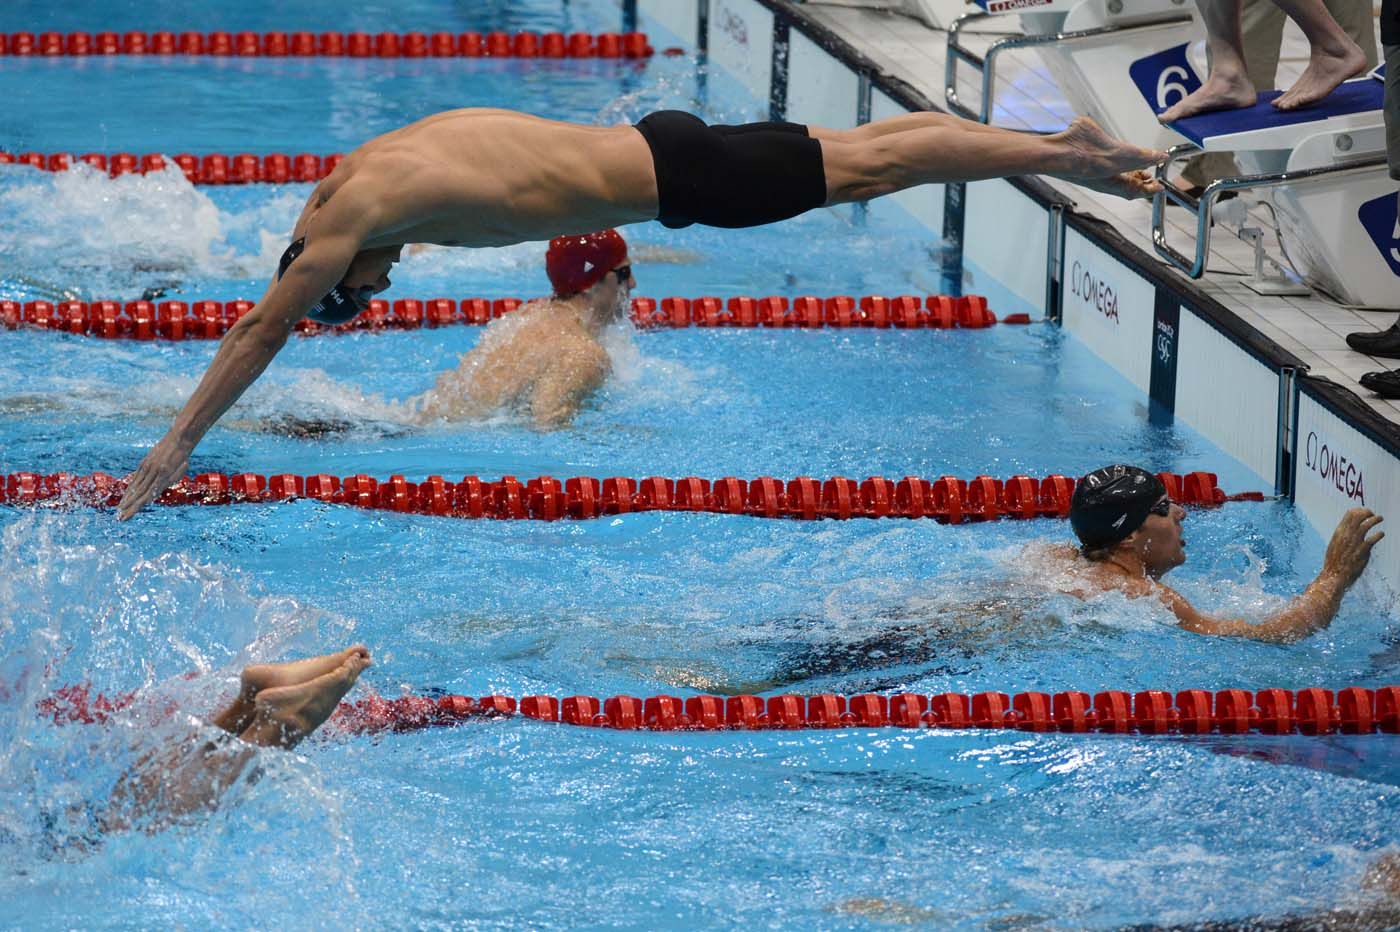 Michael phelps - Olympic swimming starting blocks ...